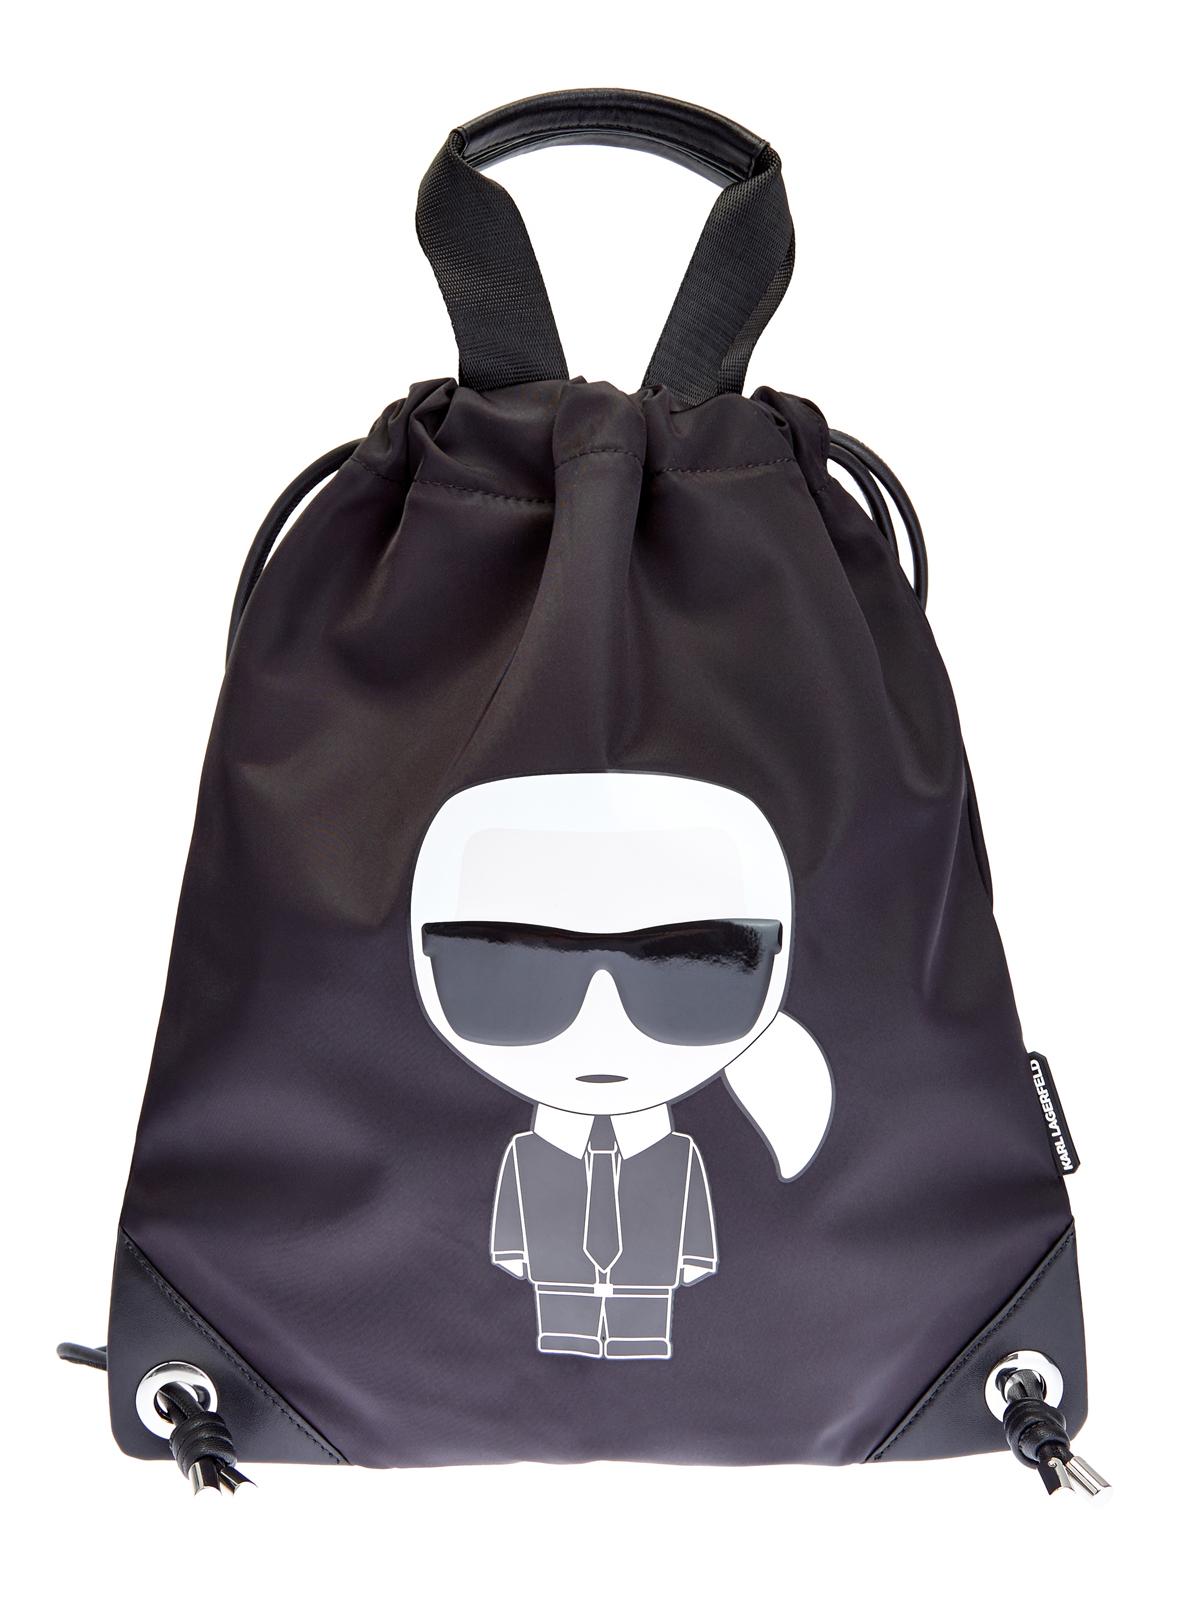 Сумка-рюкзак K/Ikonik из нейлона с макро-аппликацией